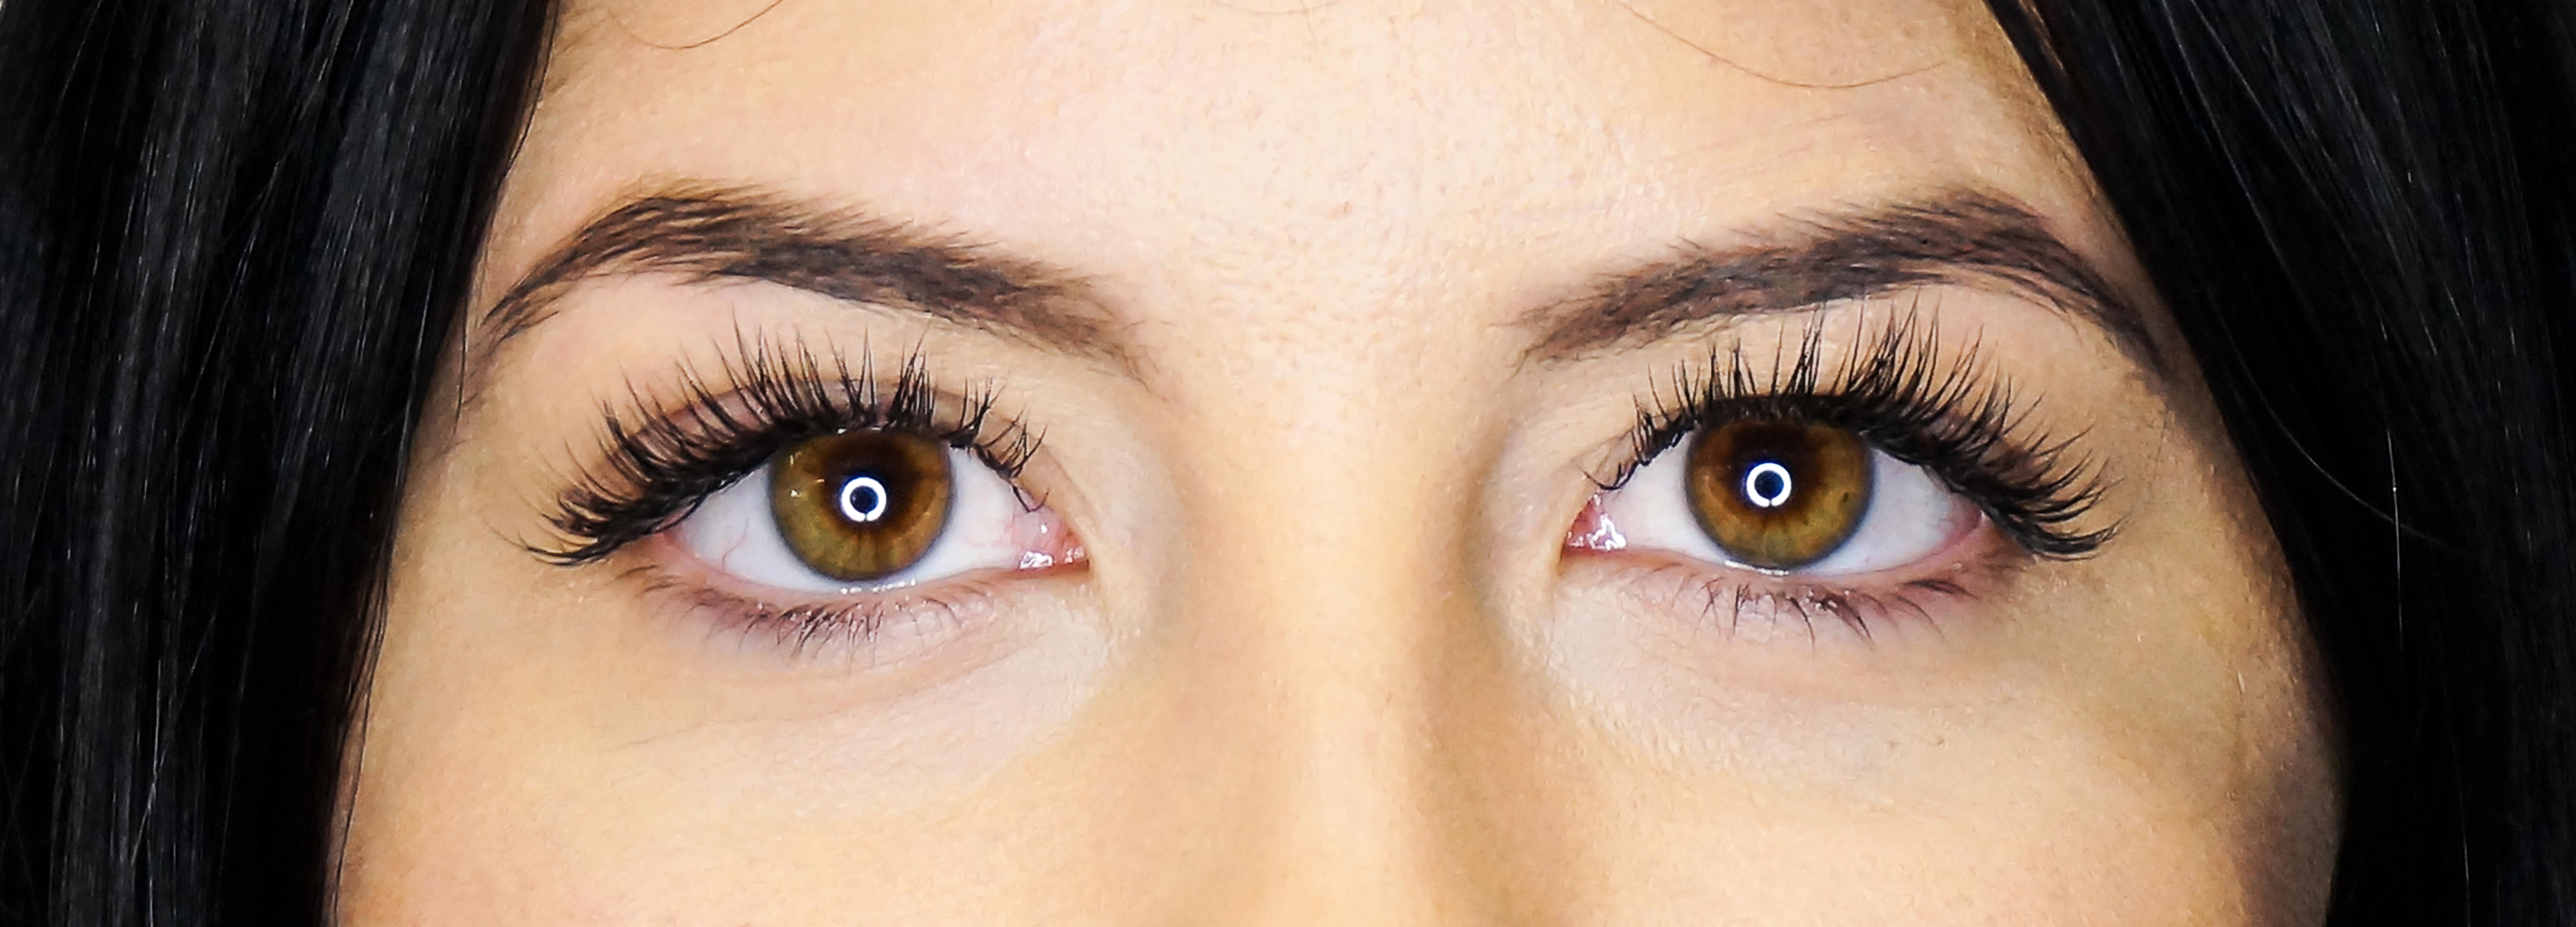 Classic Eyelash Extensions Doll Eye